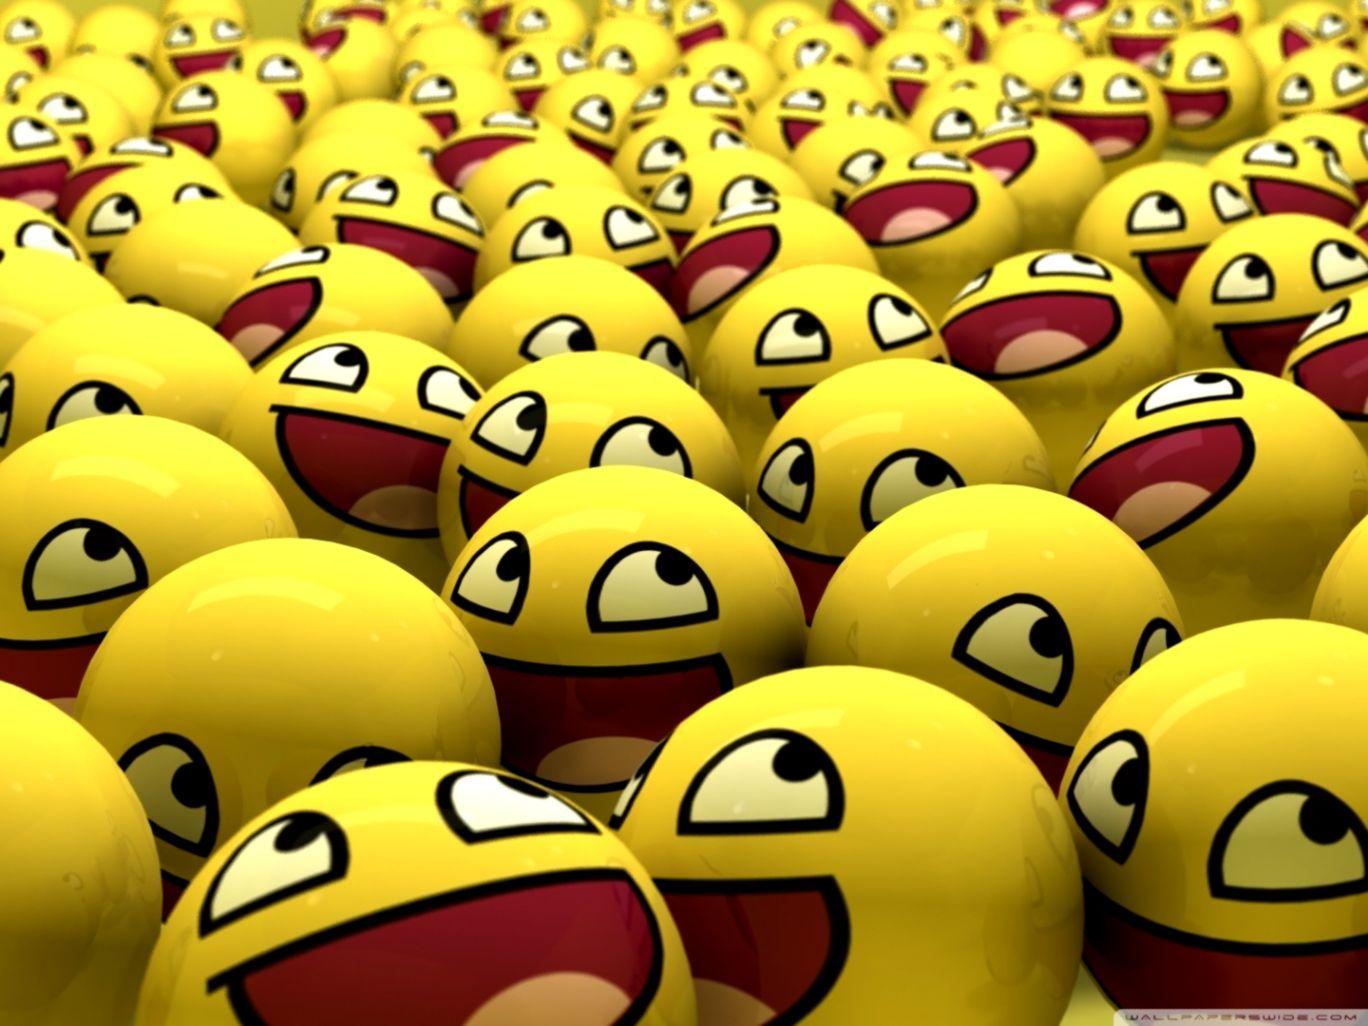 Funny Smileys 4k Hd Desktop Wallpaper For 4k Ultra Emoticon Smile 1368x1026 Wallpaper Teahub Io